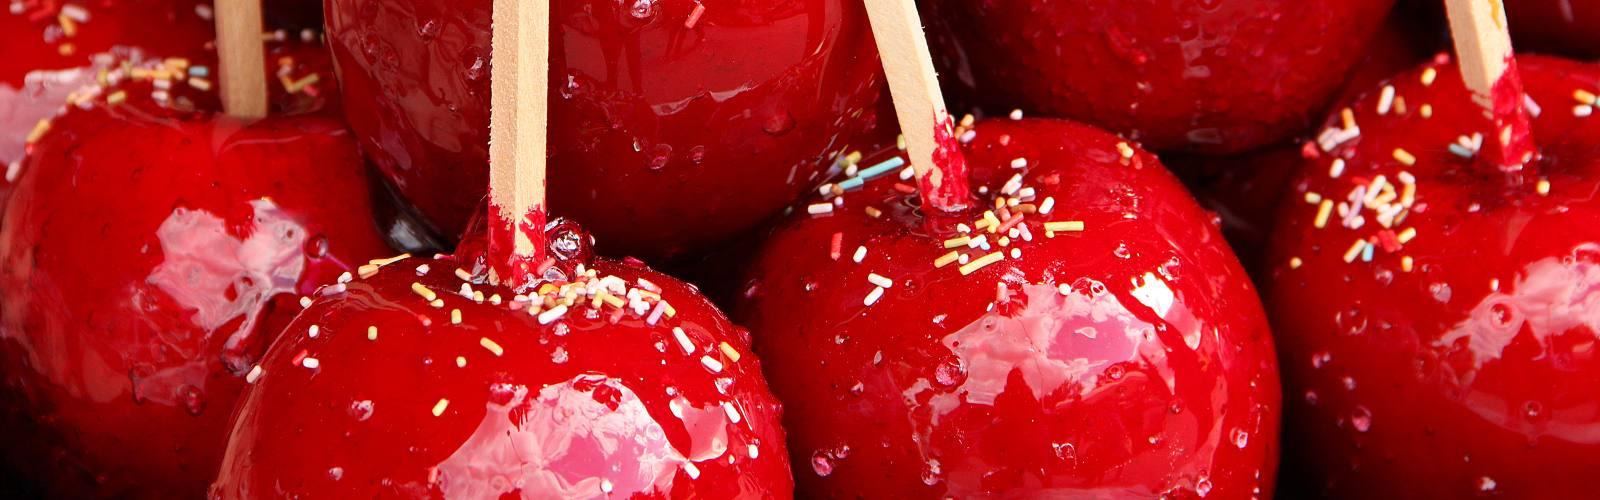 Water-friendly snacks for Hallowe'en treating